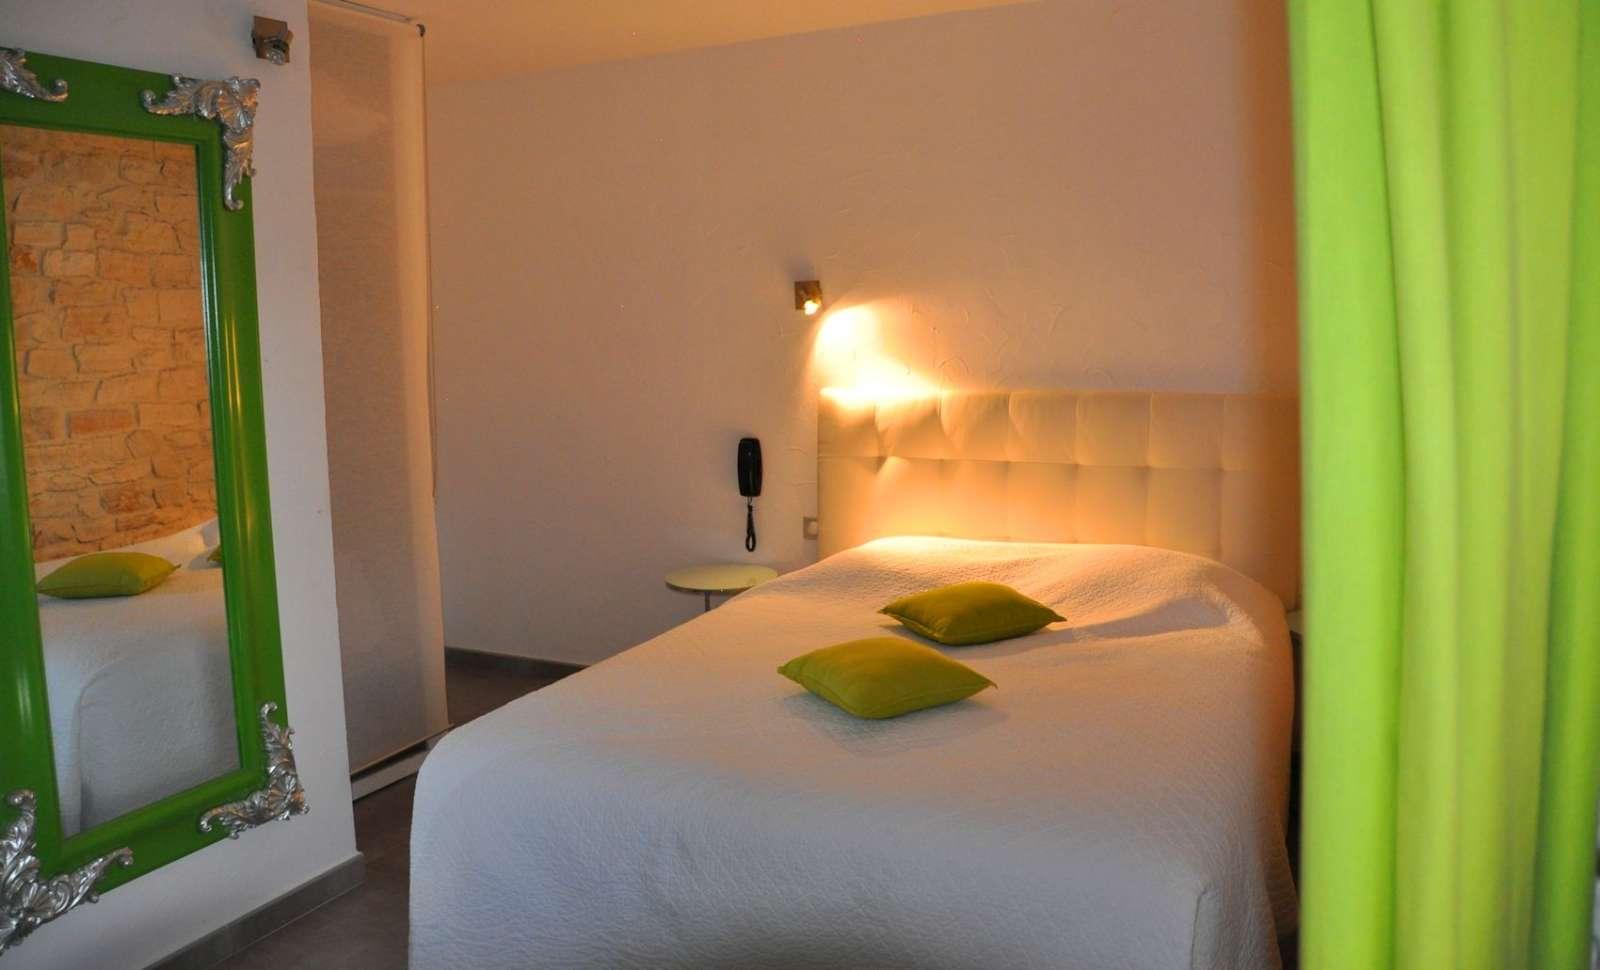 Eksempel p&aring; <a href=http://www.in-france.dk/frankrig/provence-alpes-cote-dazur/barjac/hotel-le-mas-du-terme/r/27396/>Charme Superior</a>